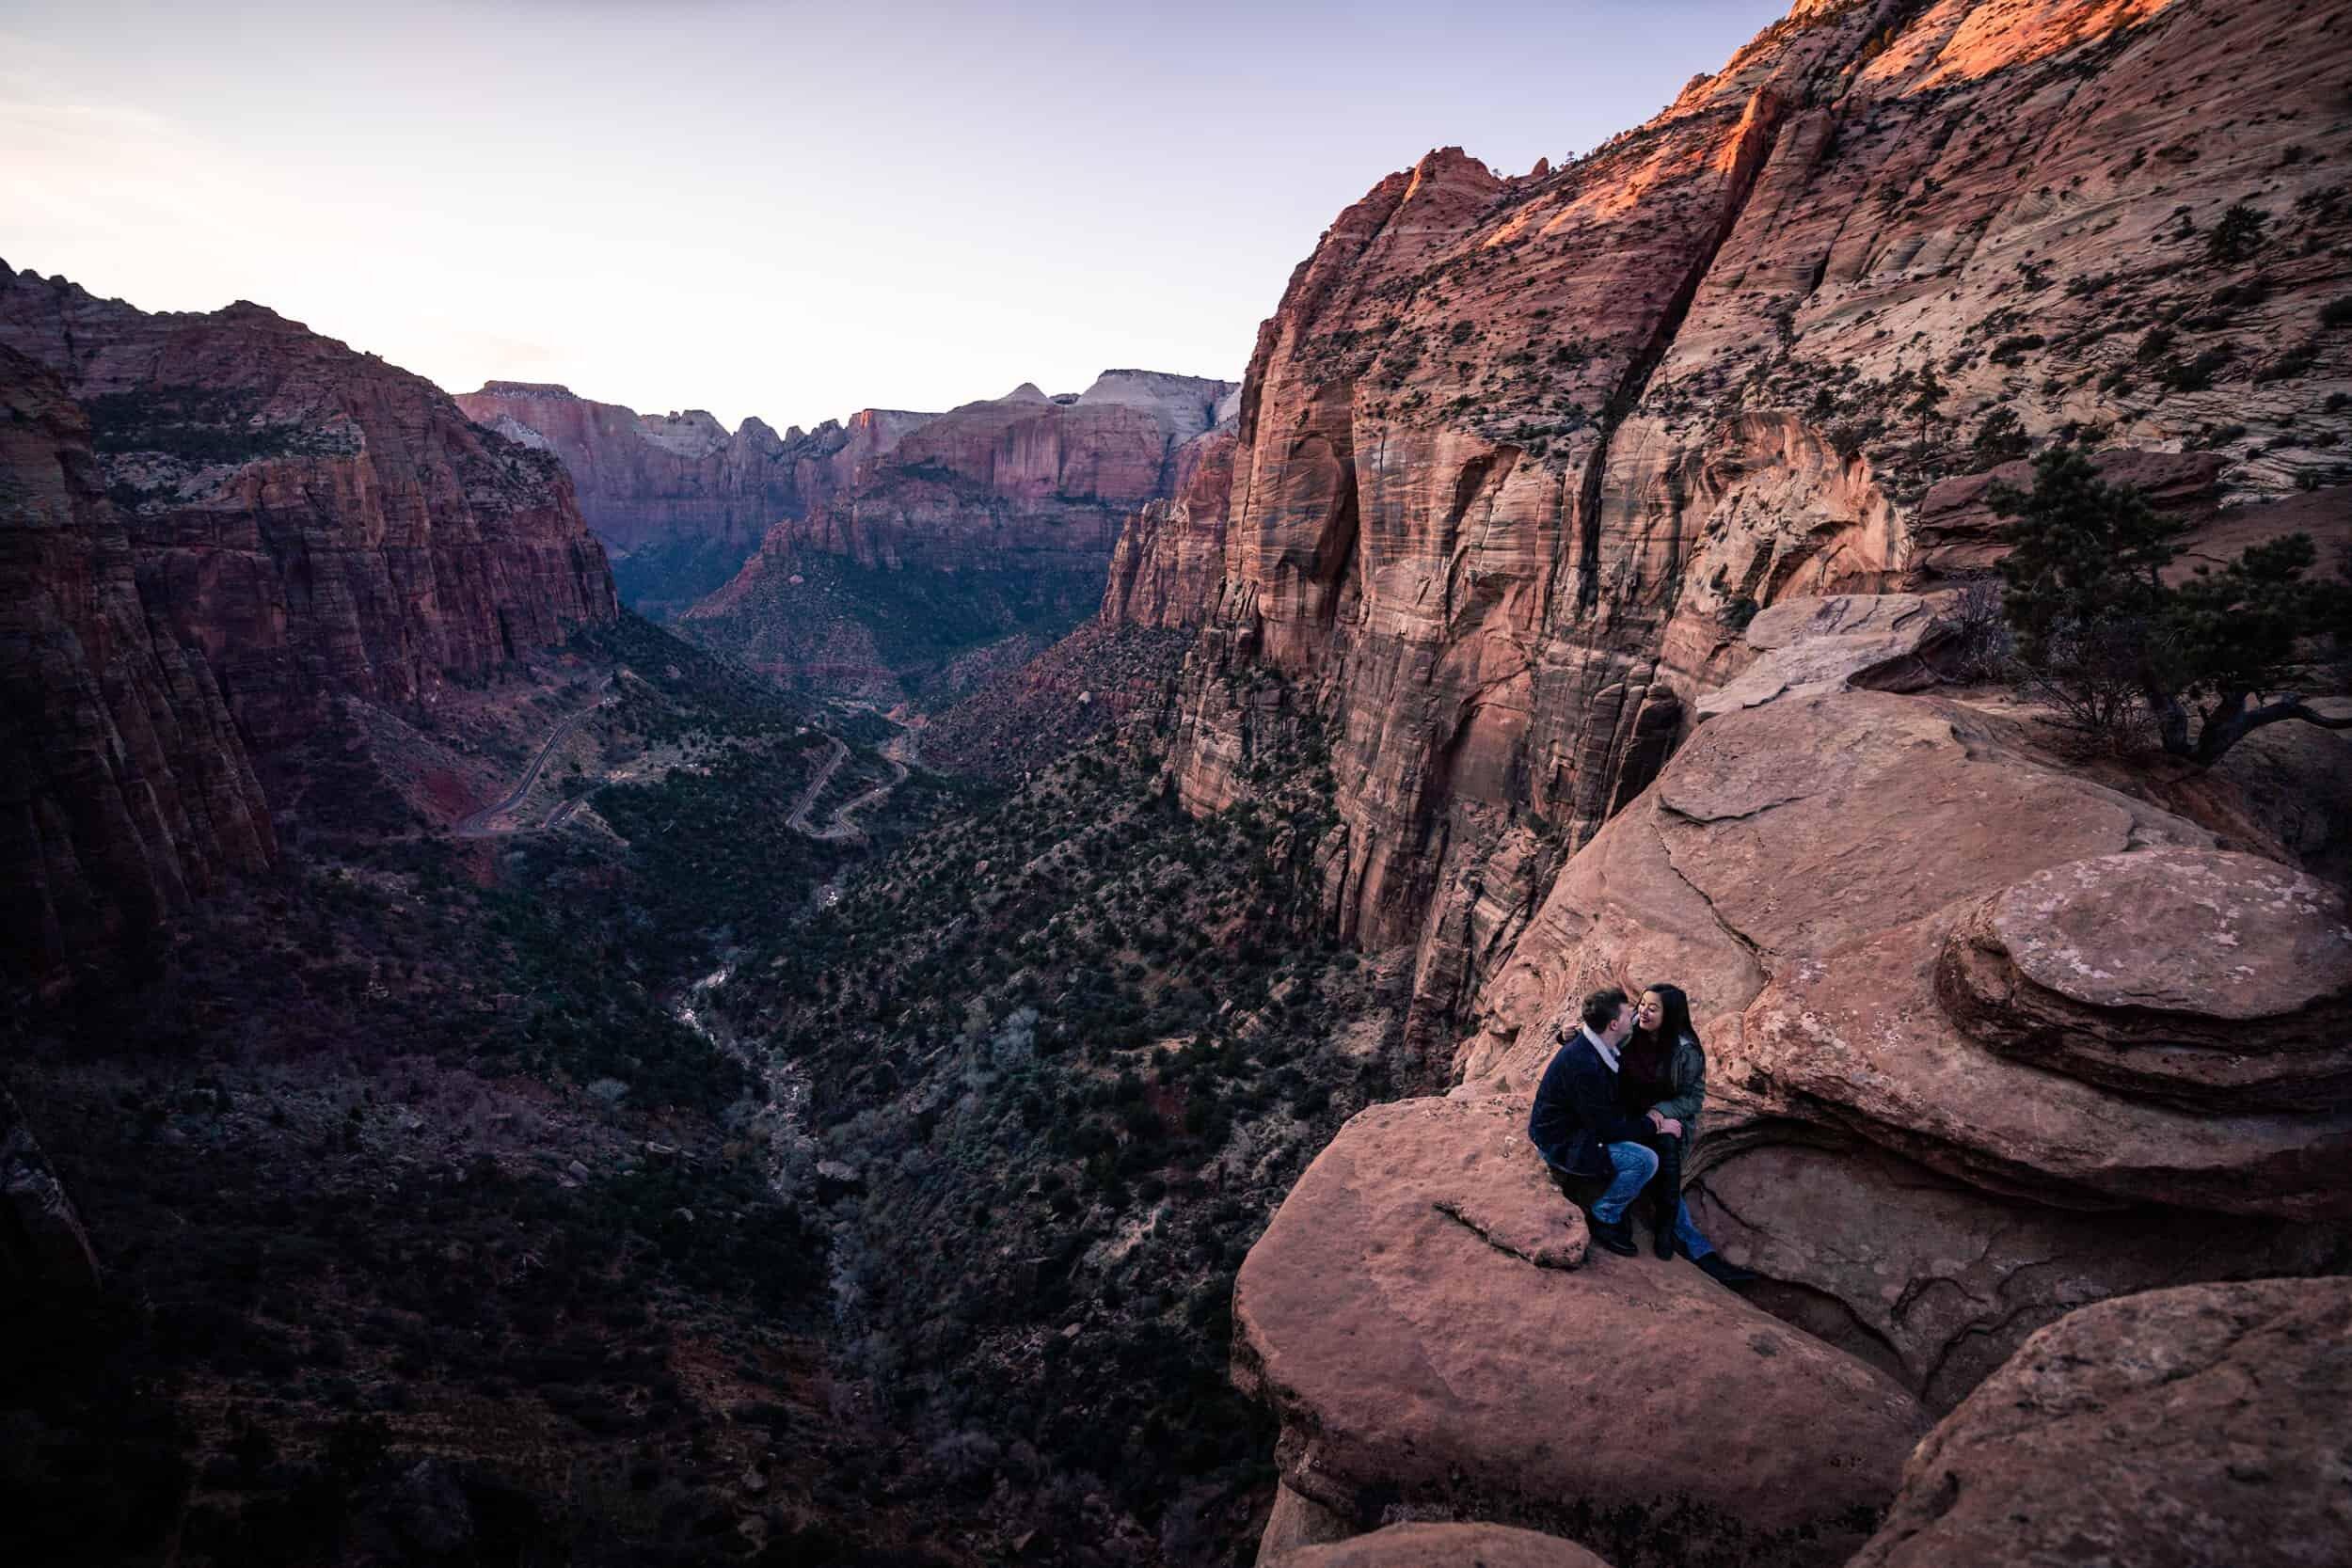 zion moab utah adventure elopement wedding photography videography 1